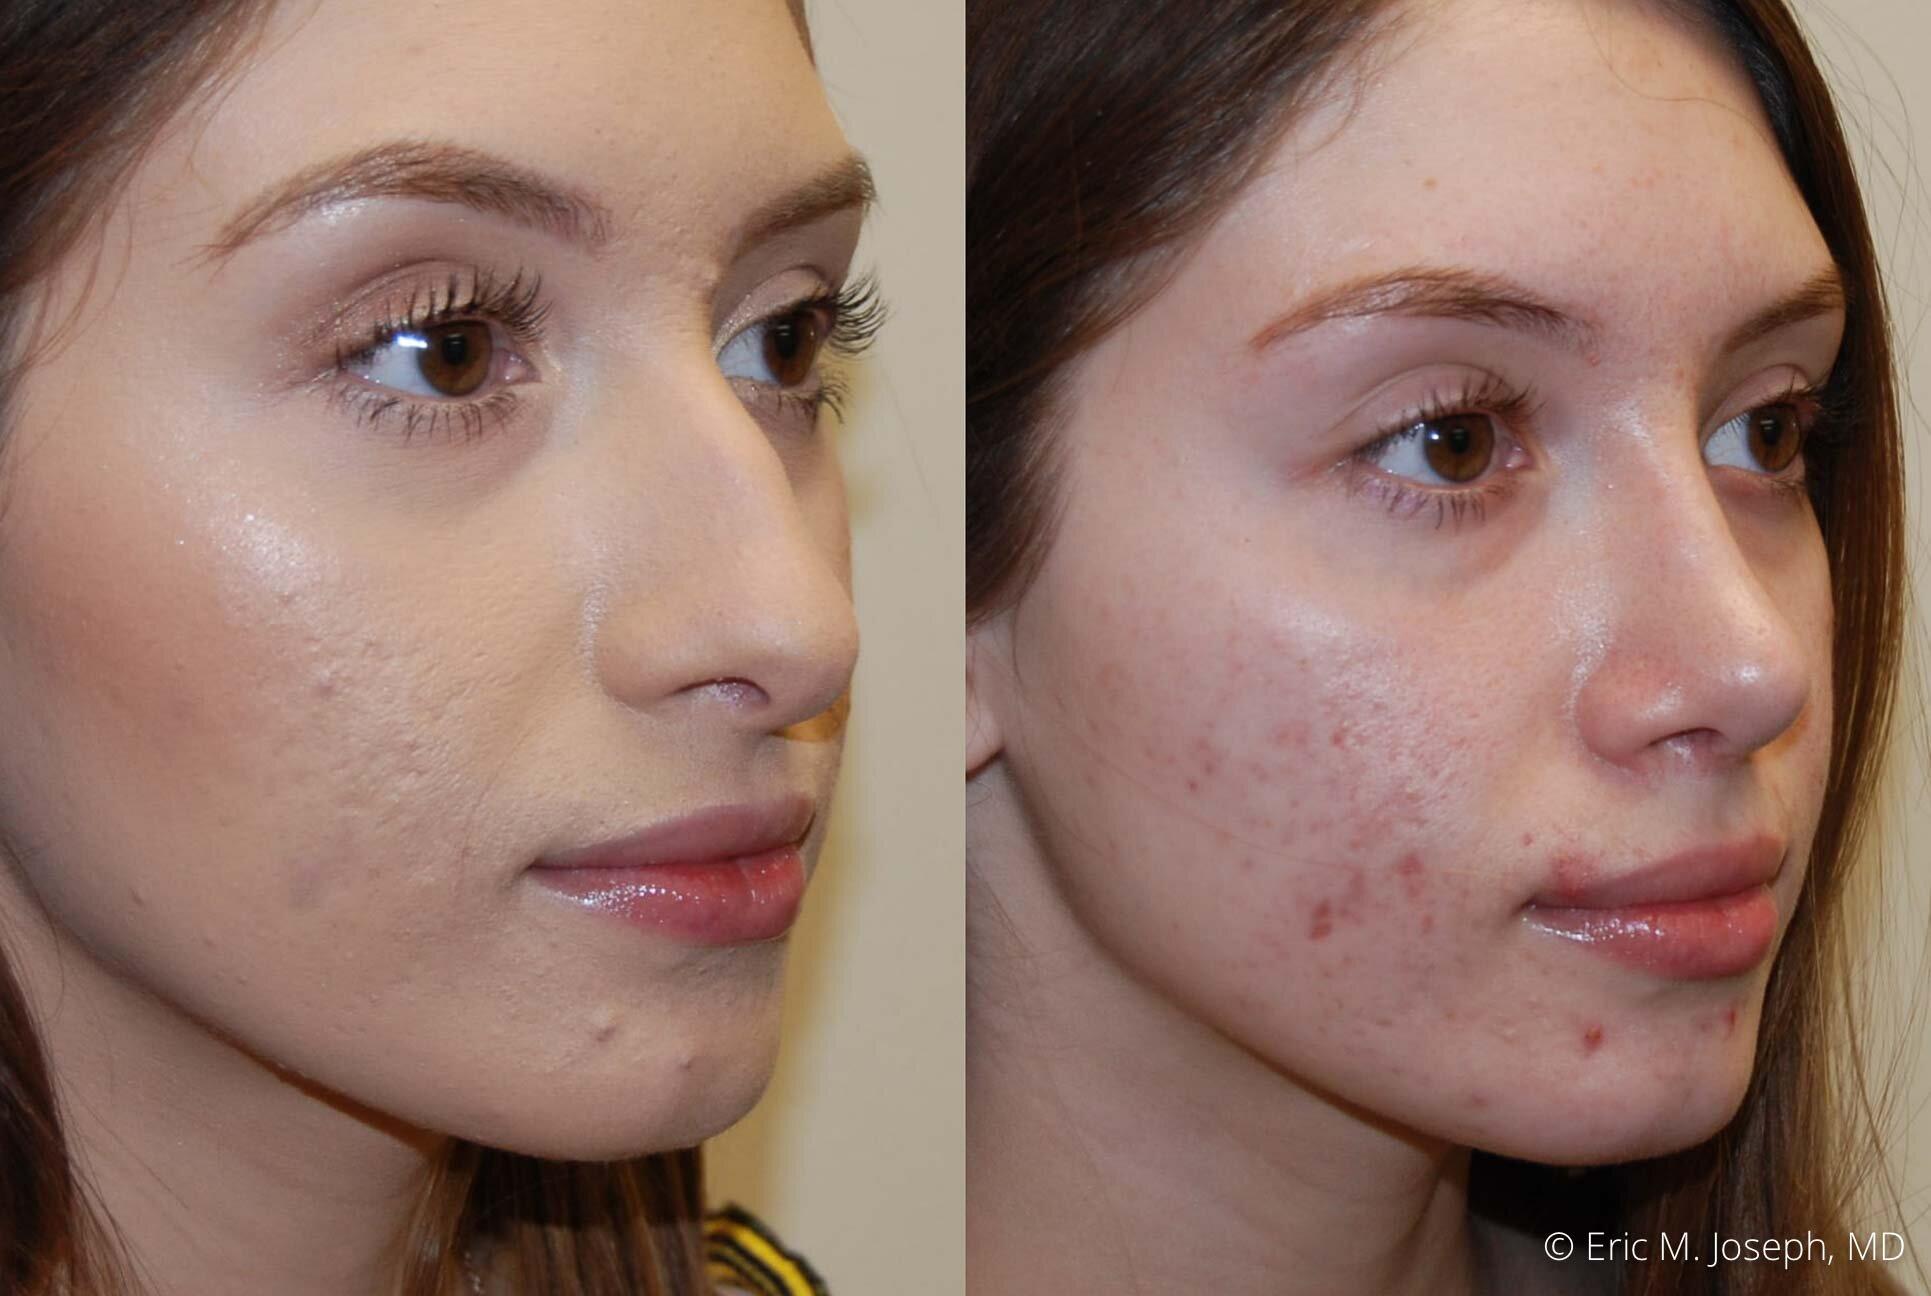 rhinoplasty-nose-job-nyc-nj-0471.jpg